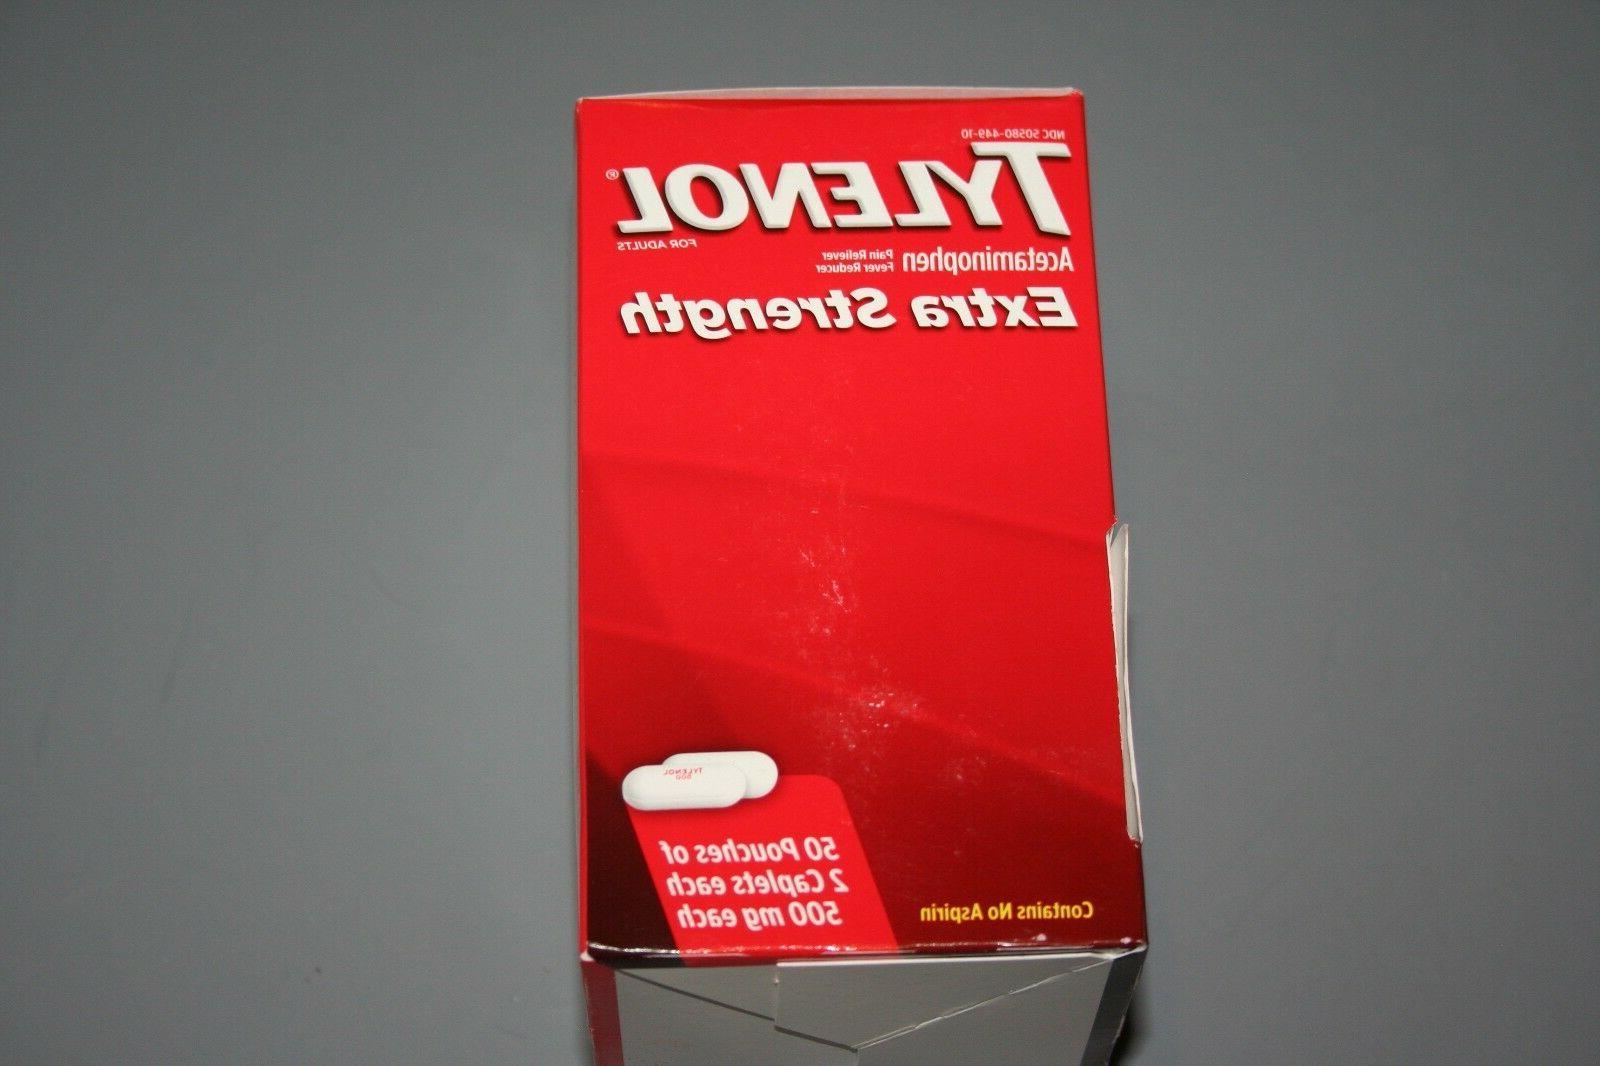 TYLENOL Box 50 - 2 caplets